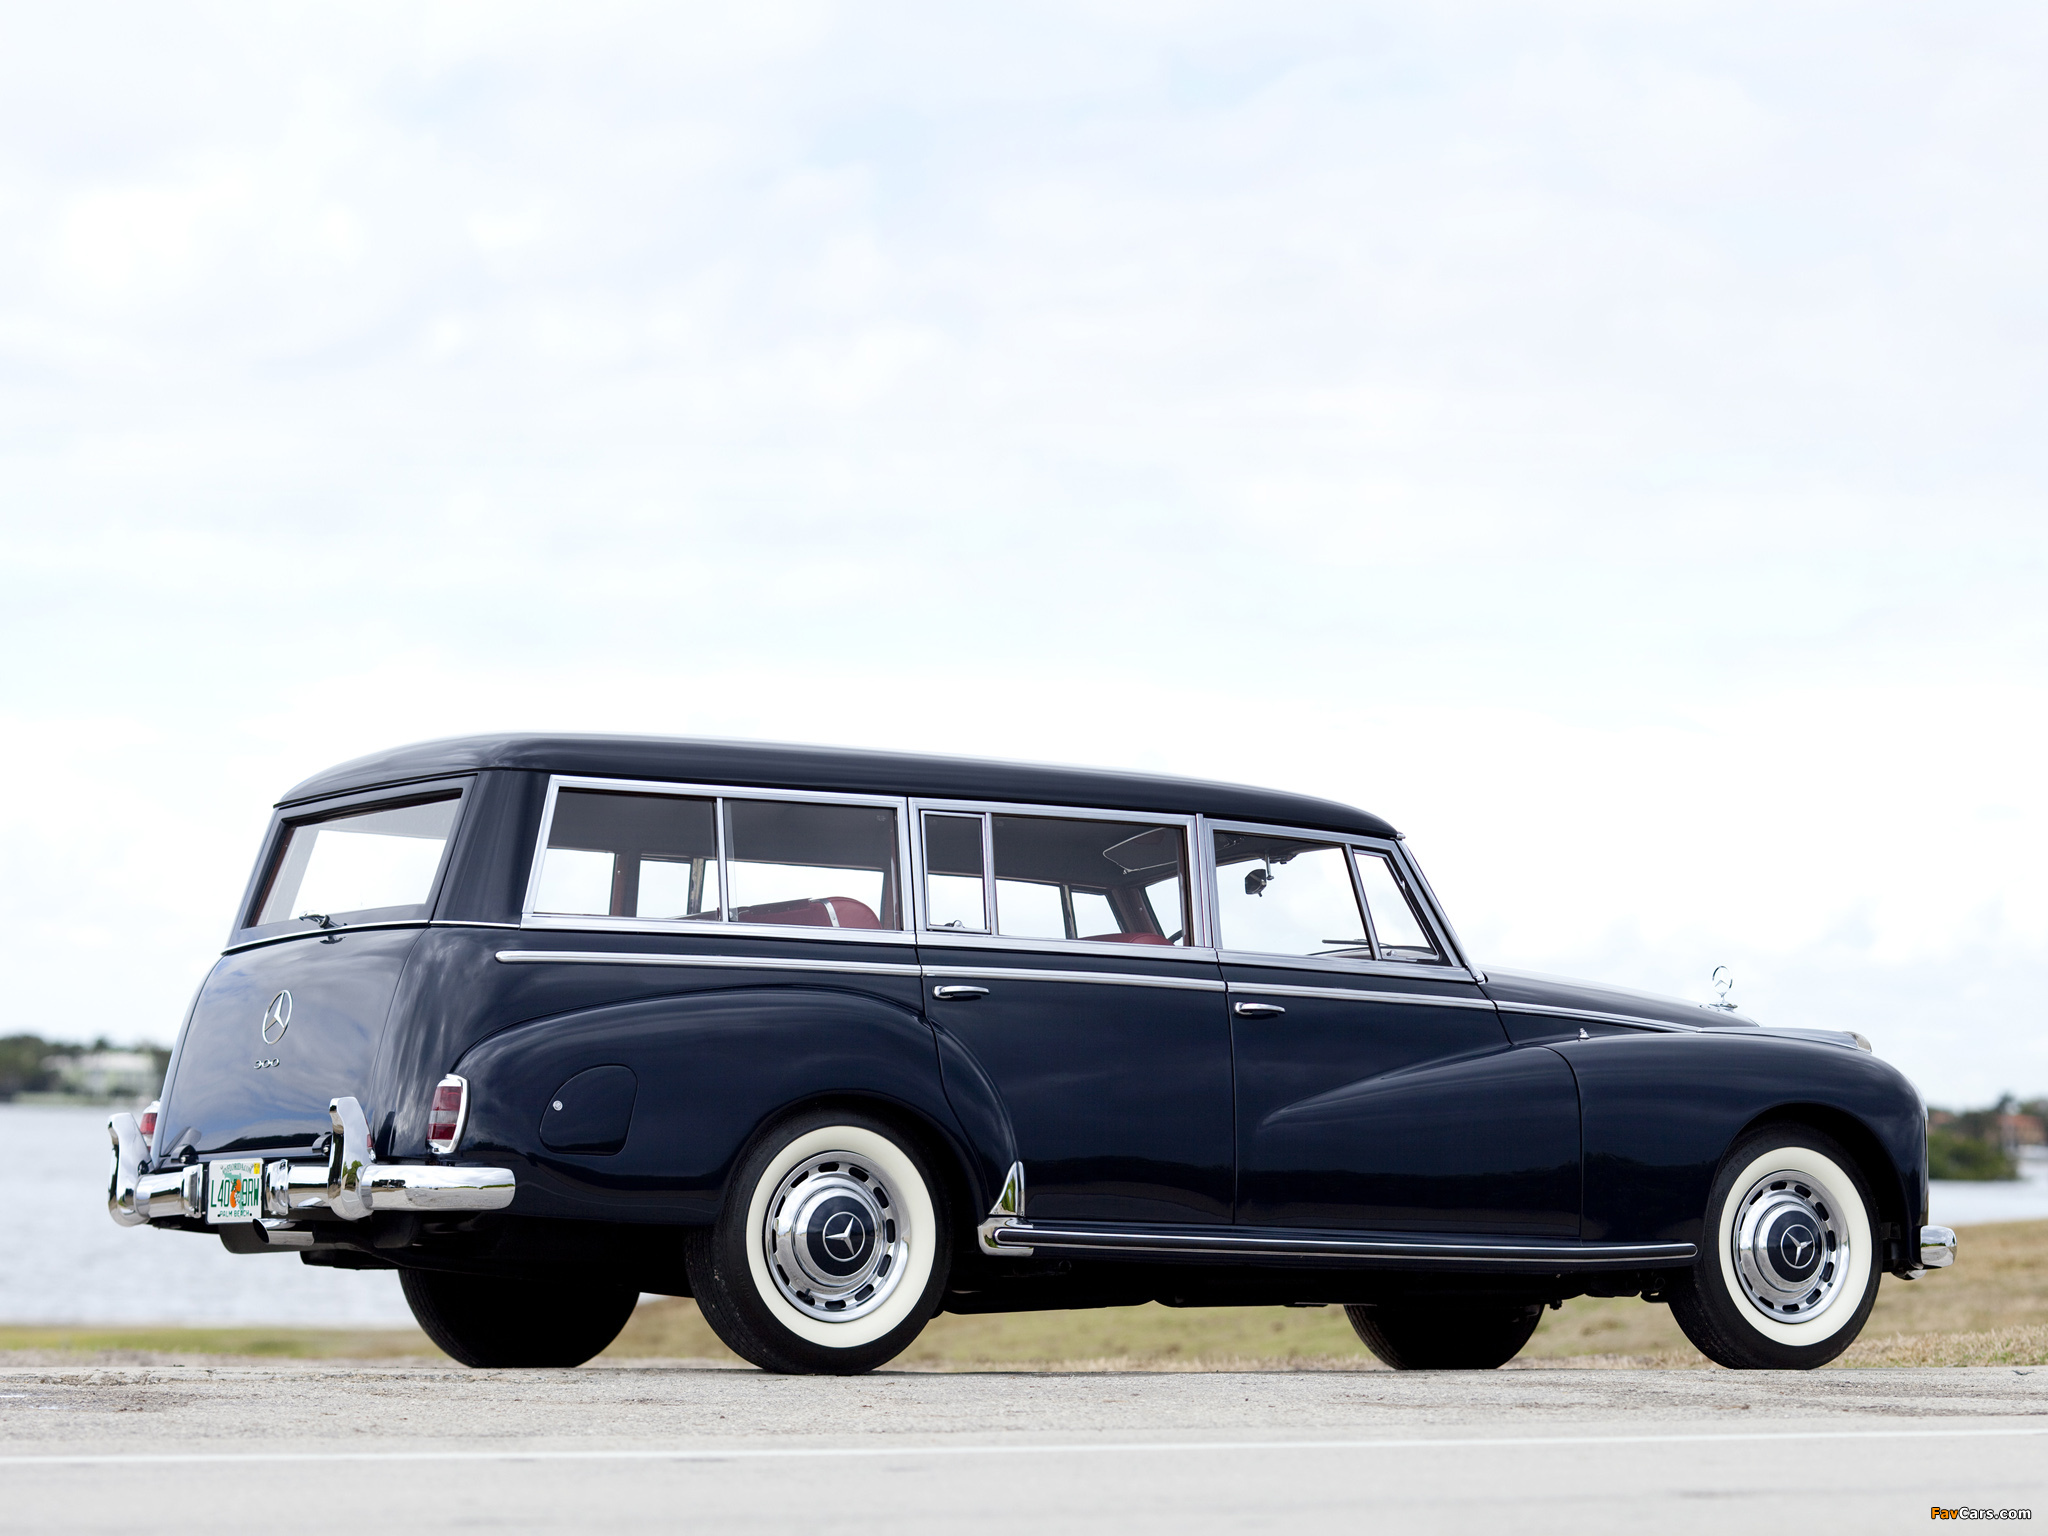 Photos of mercedes benz 300c station wagon by binz 1956 for Mercedes benz 300c